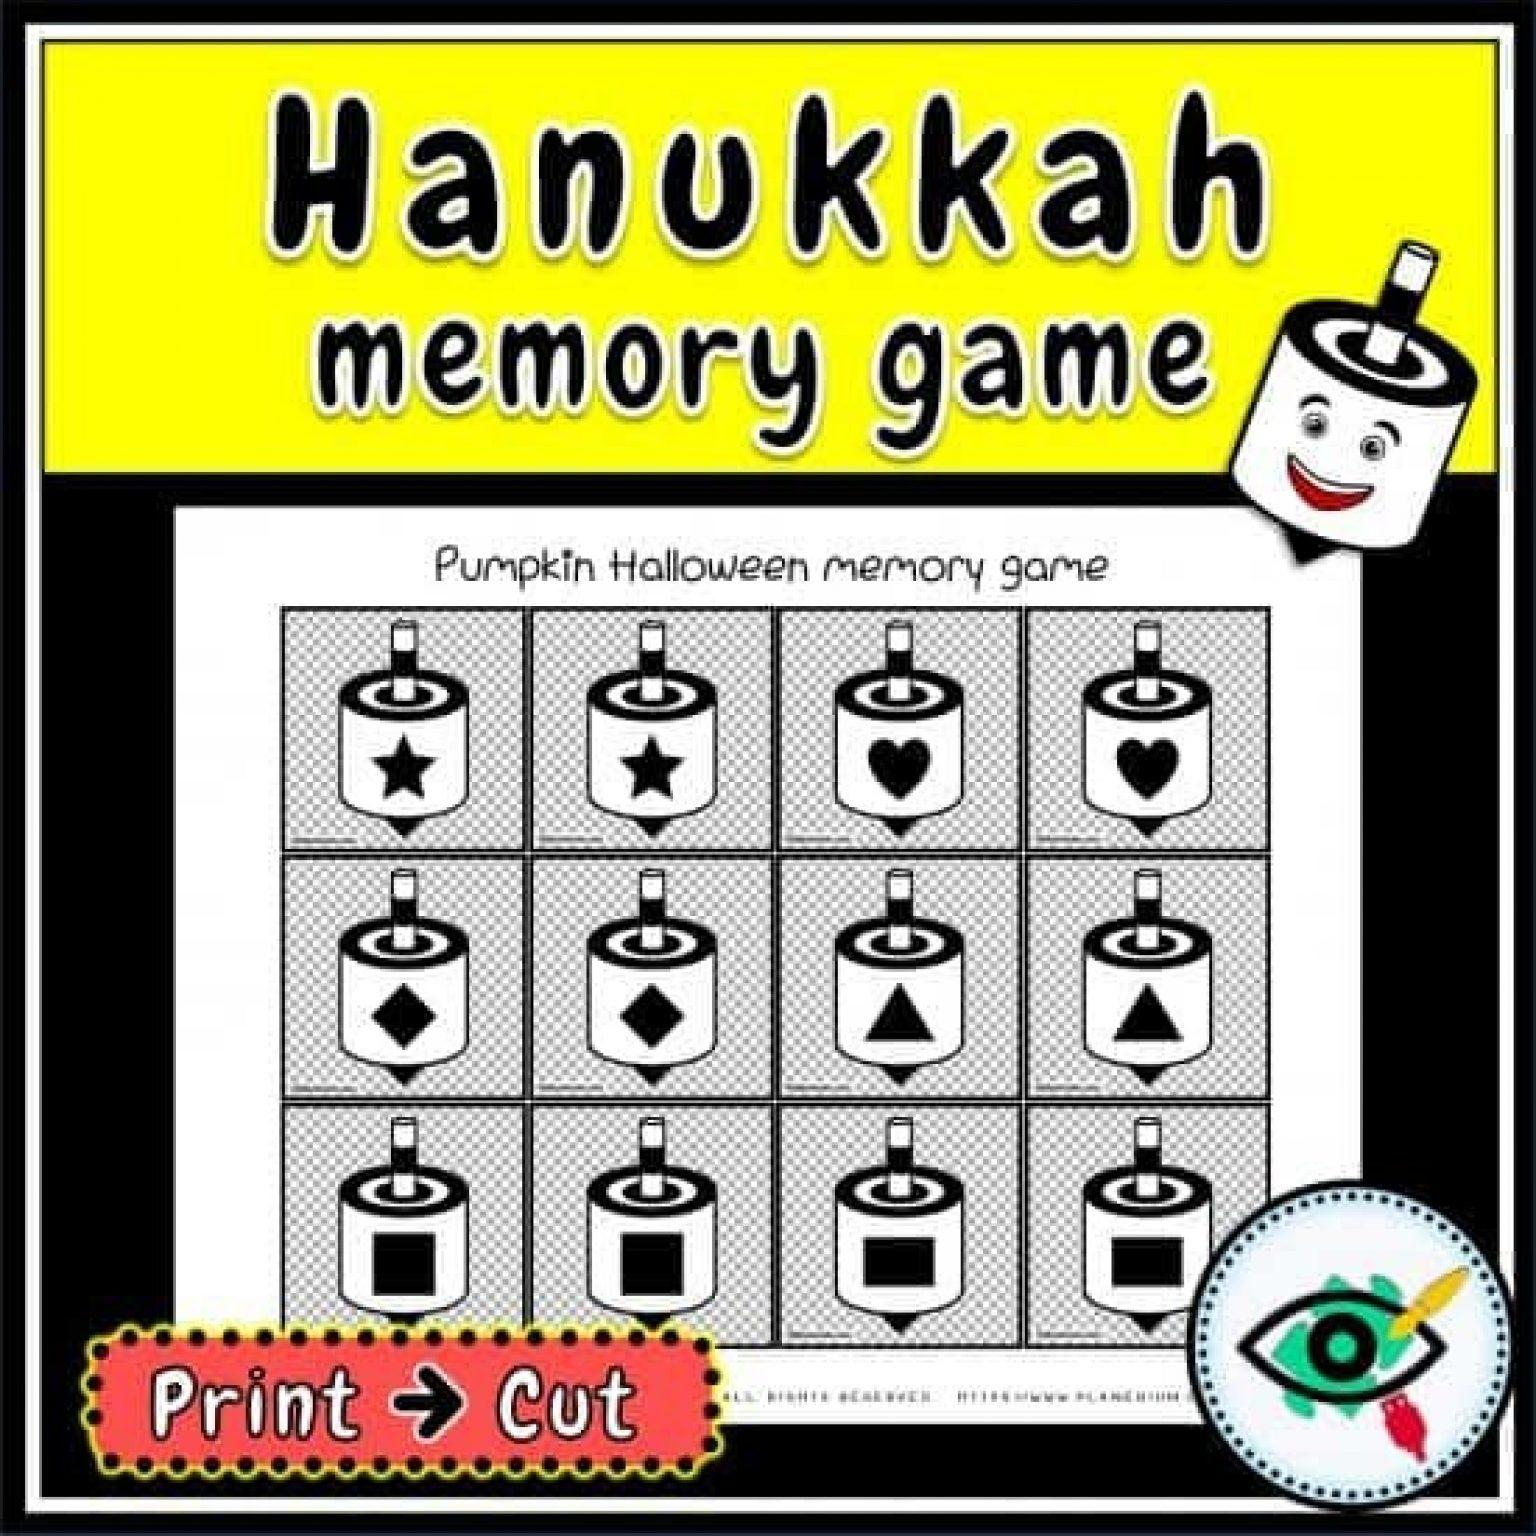 hanukkah-dreidel-shape-memory-game-title1